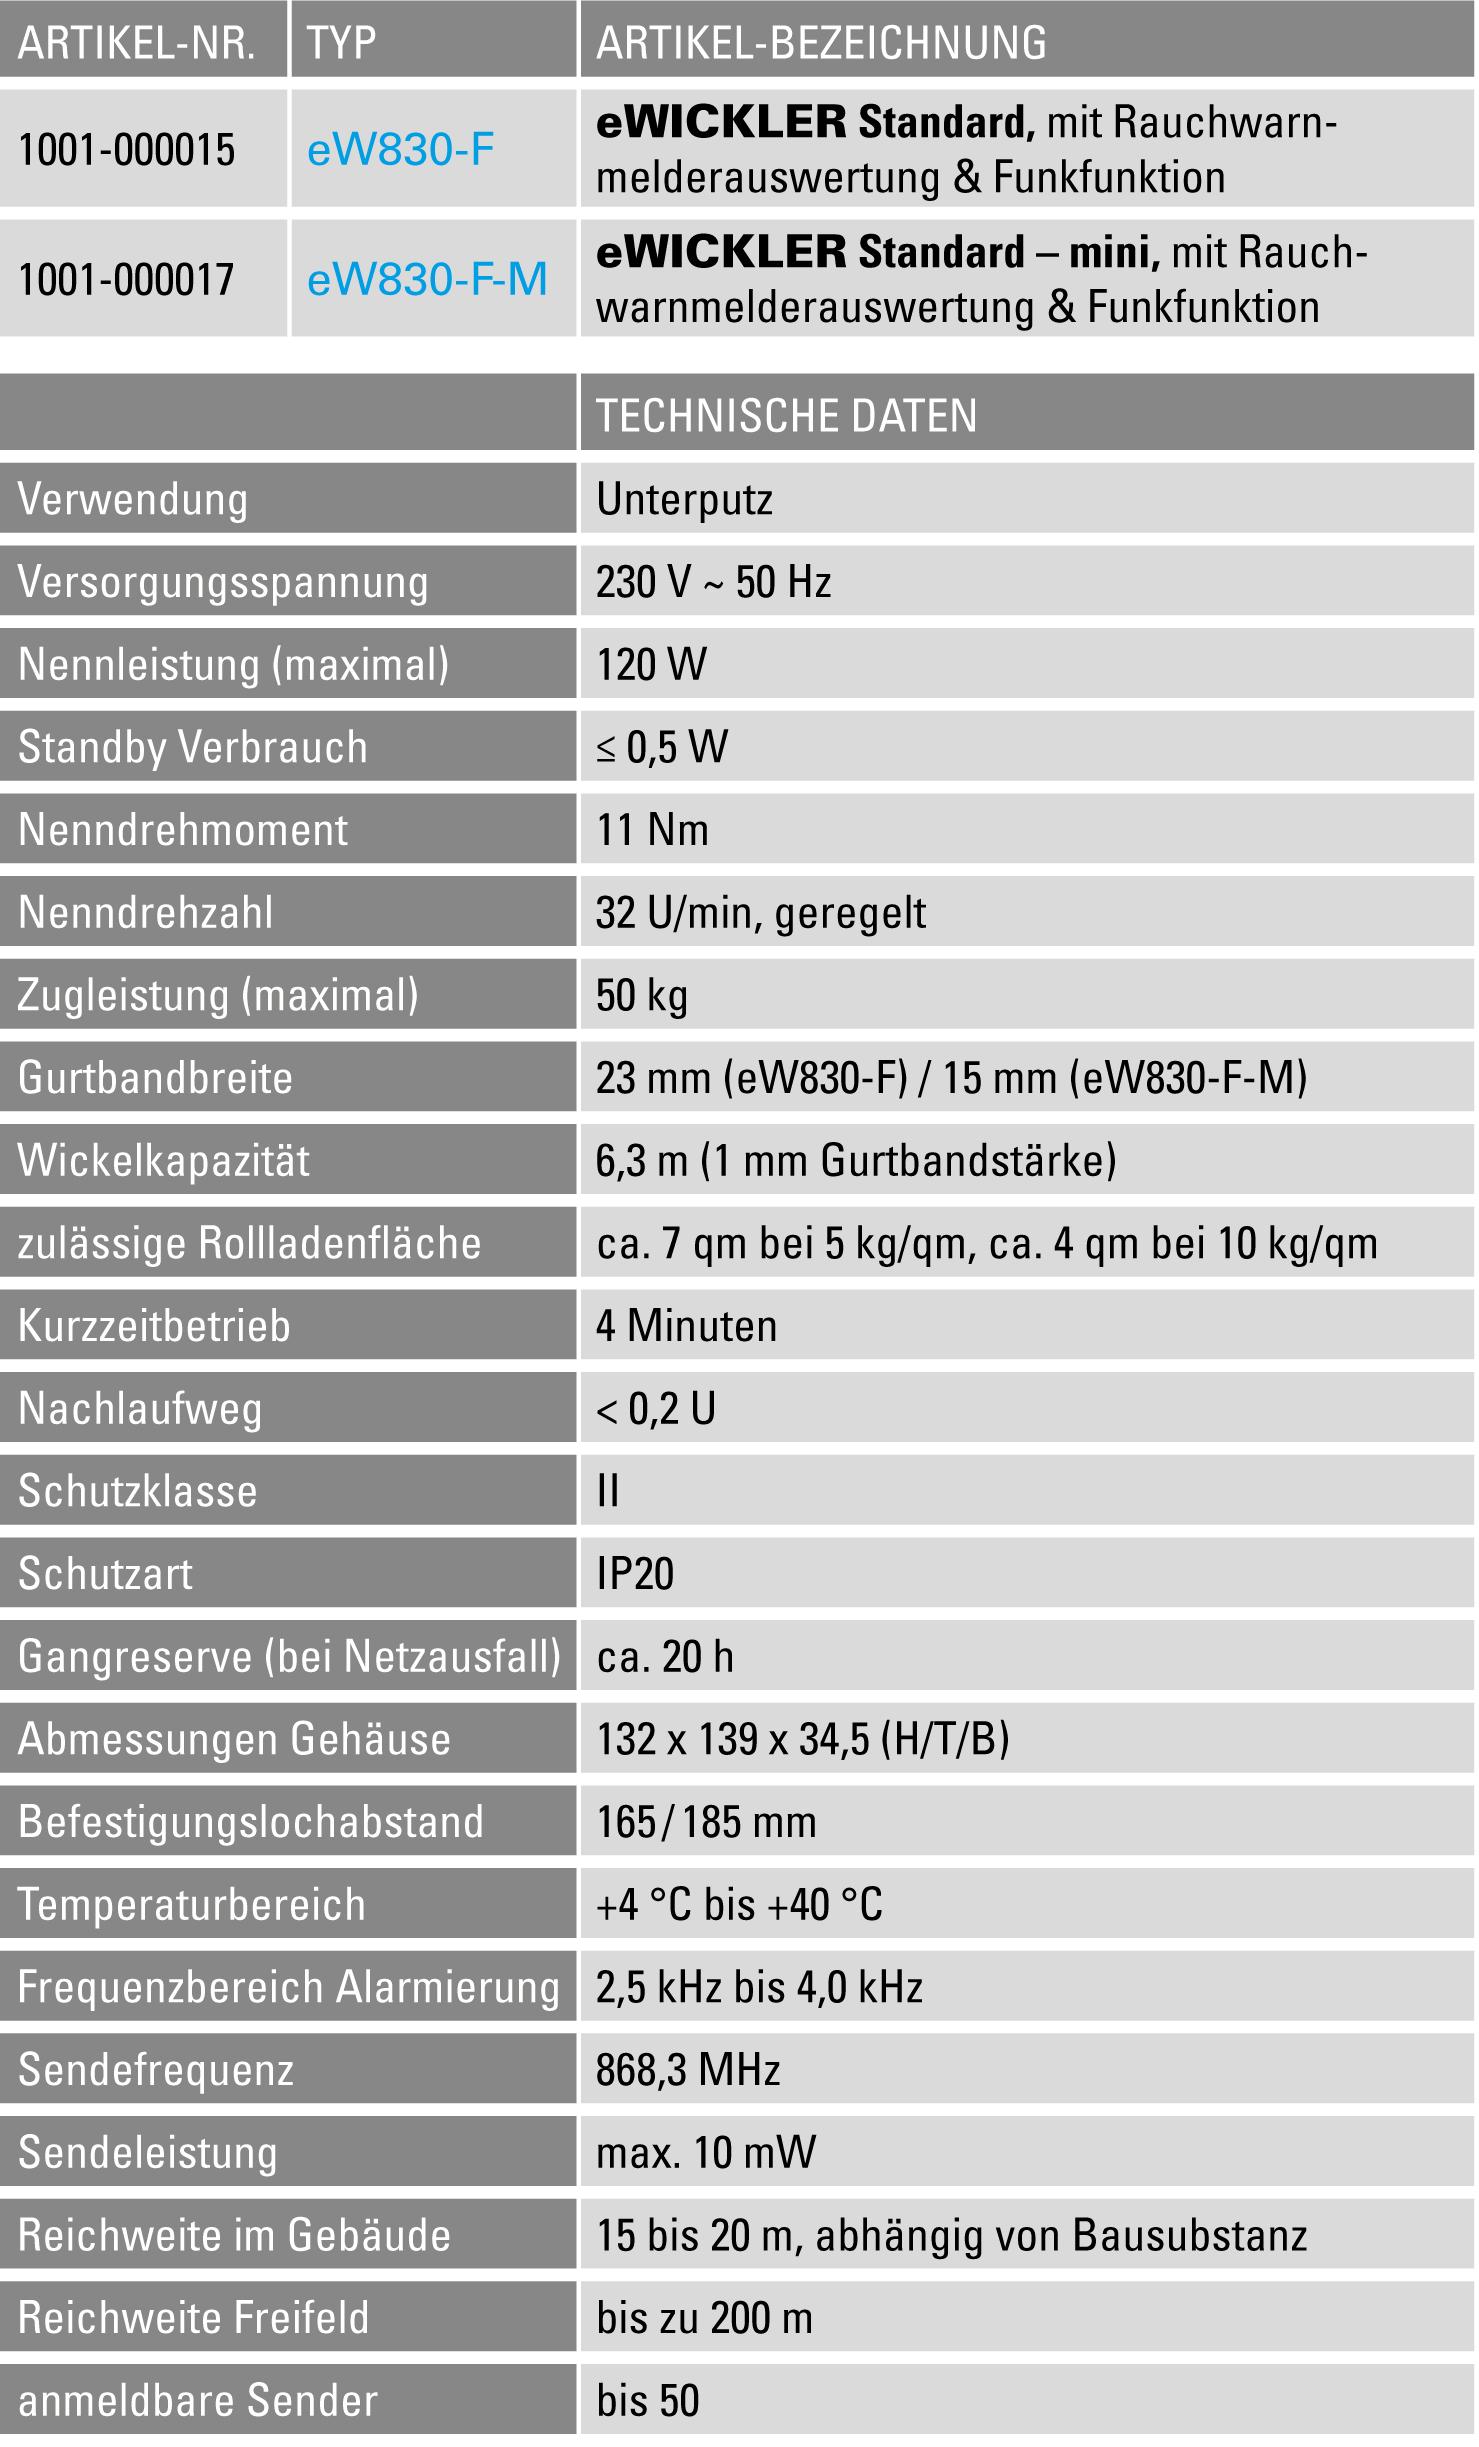 ew830-F-Technische-Daten